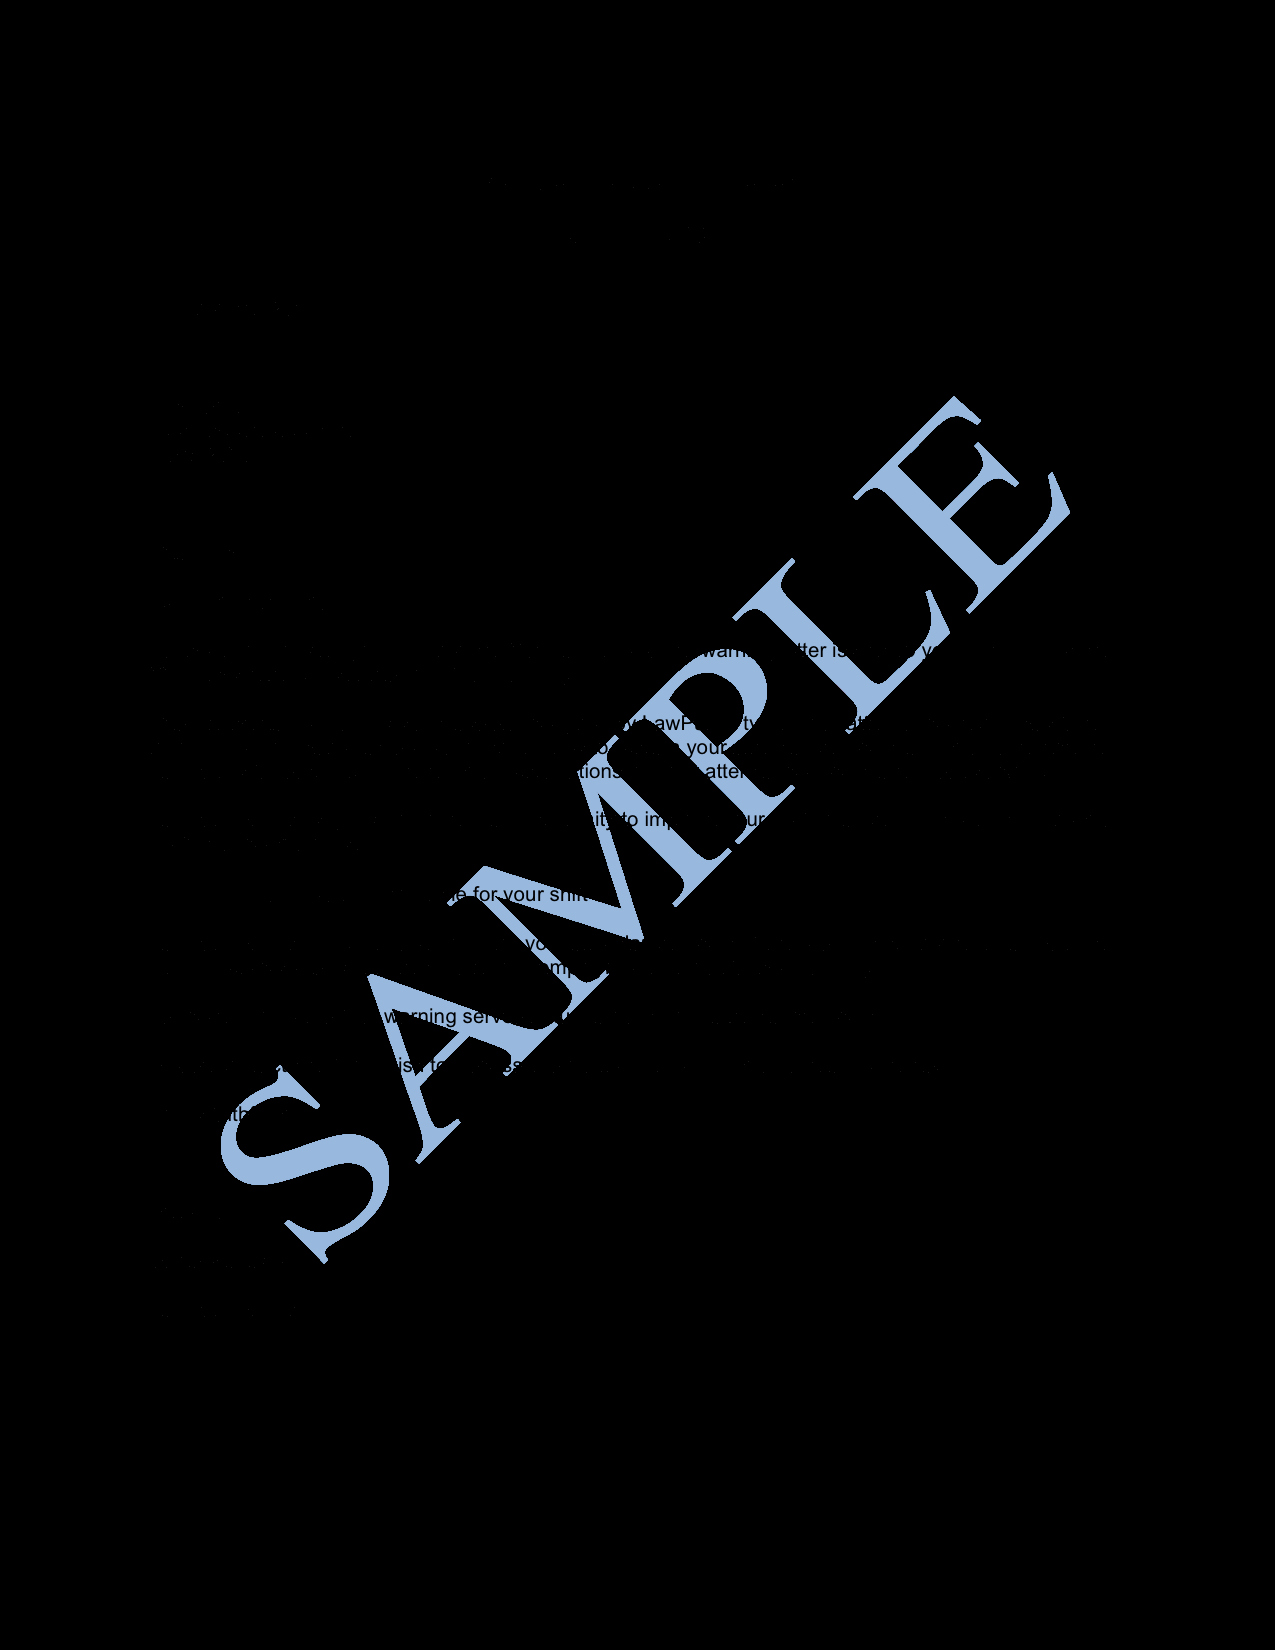 Warn Letter Samples Fresh Final Warning Letter Sample Lawpath